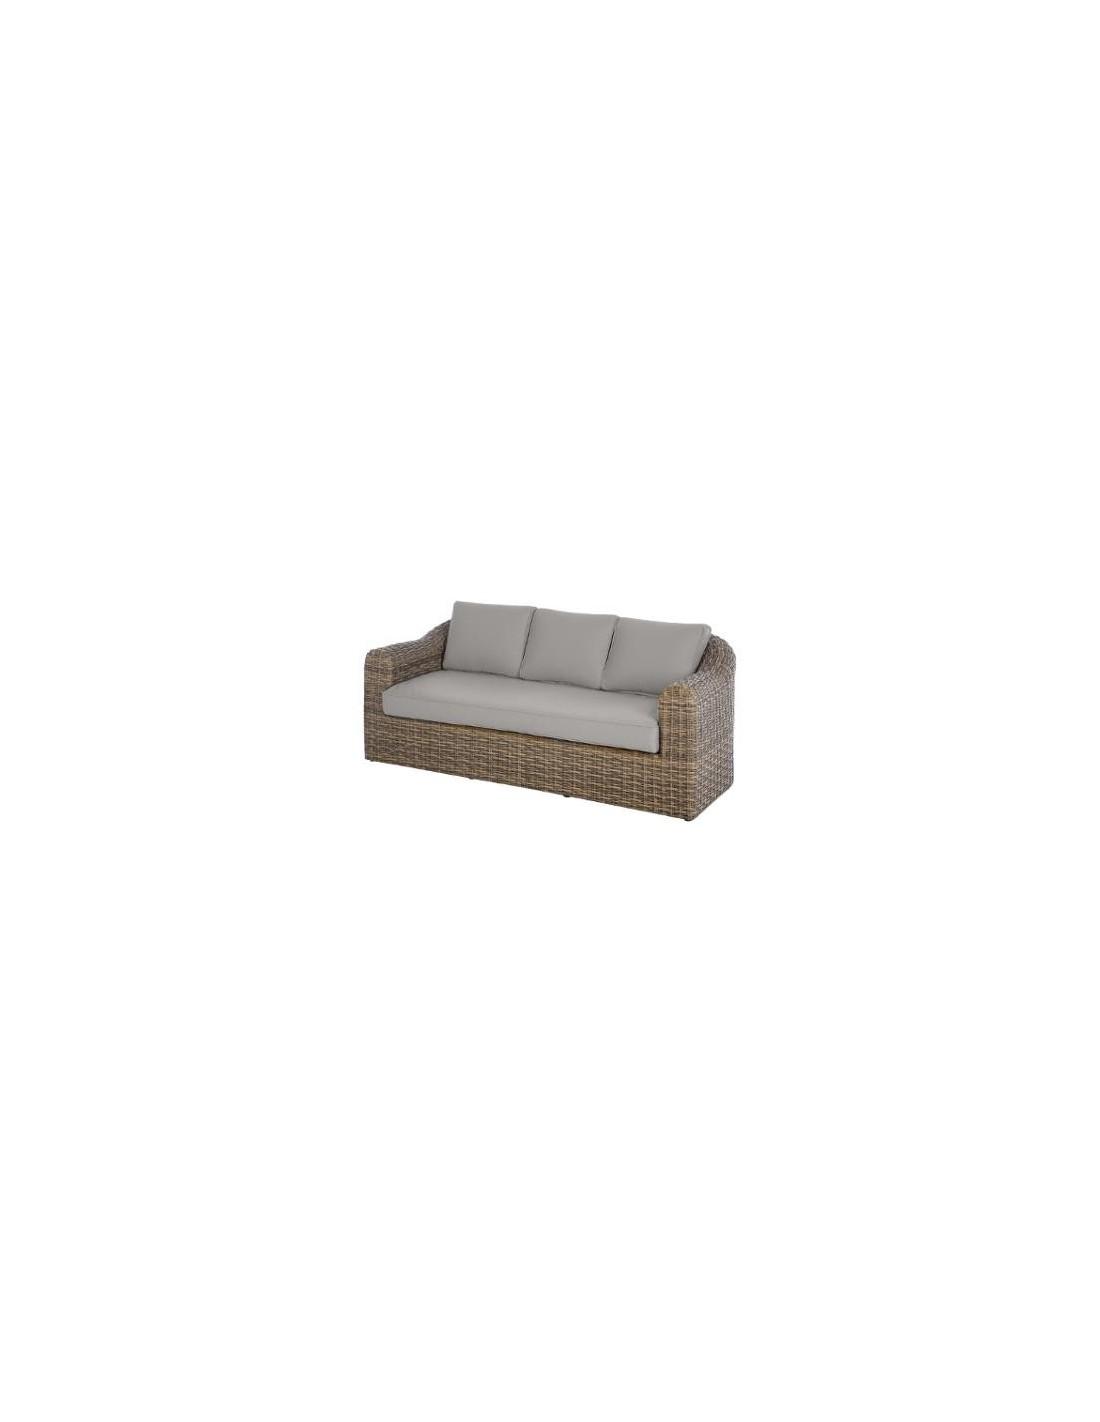 canap 3 places moor a aluminium et r sine hesperide. Black Bedroom Furniture Sets. Home Design Ideas